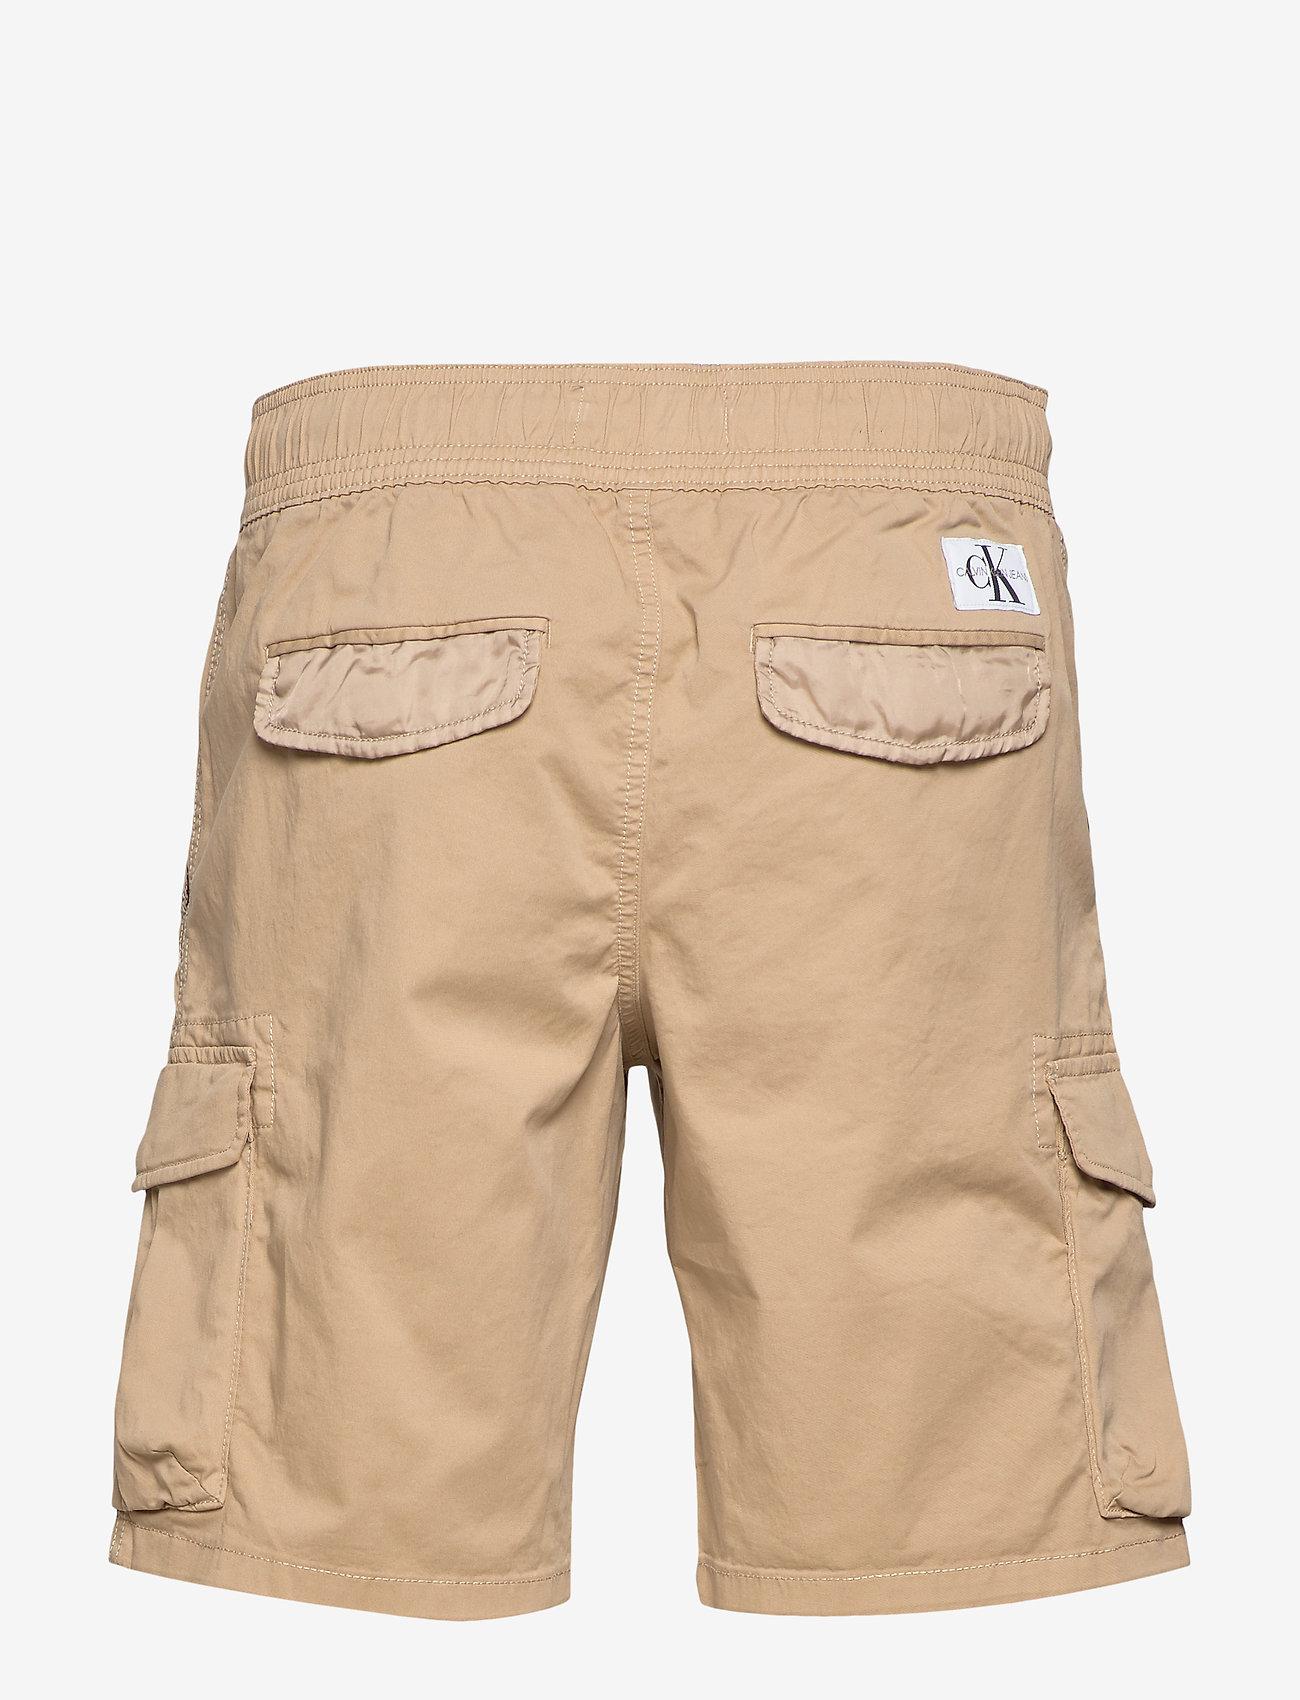 Calvin Klein Jeans - SIMPLE WASHED CARGO SHORT - cargo shorts - travertine - 1